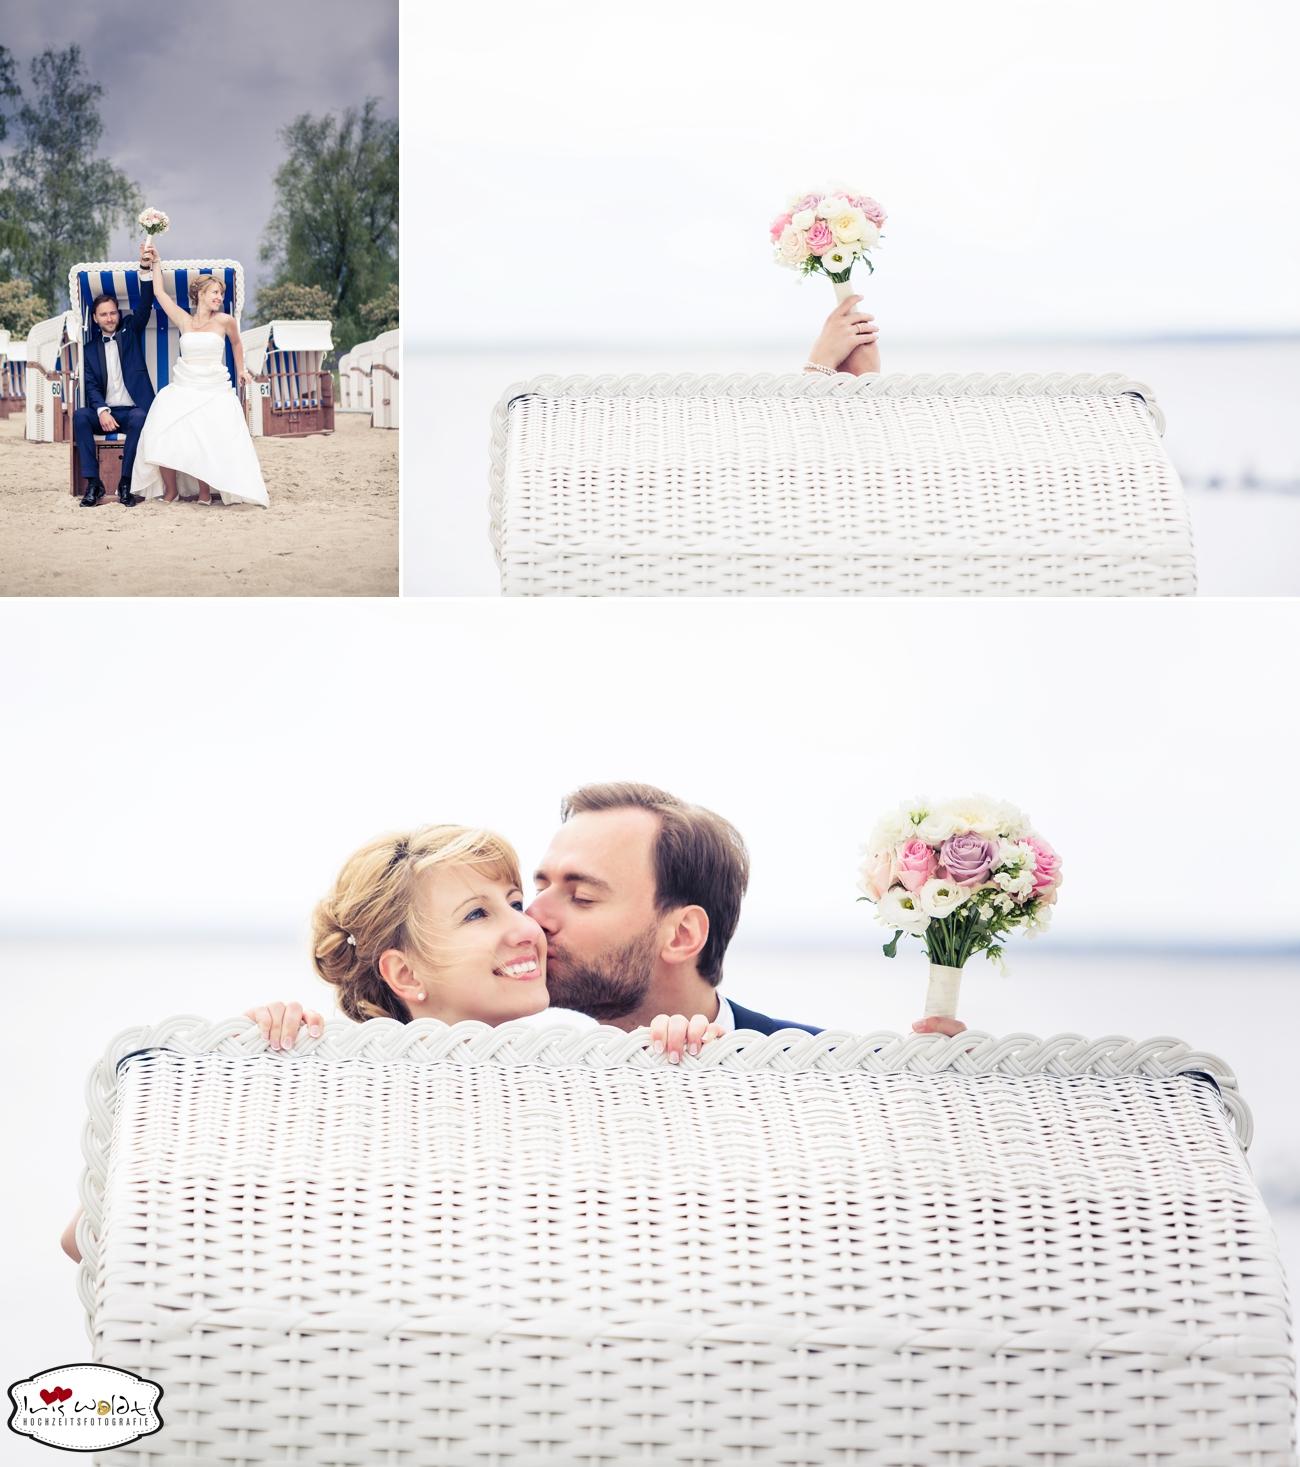 Heiraten in Uekermuende 22